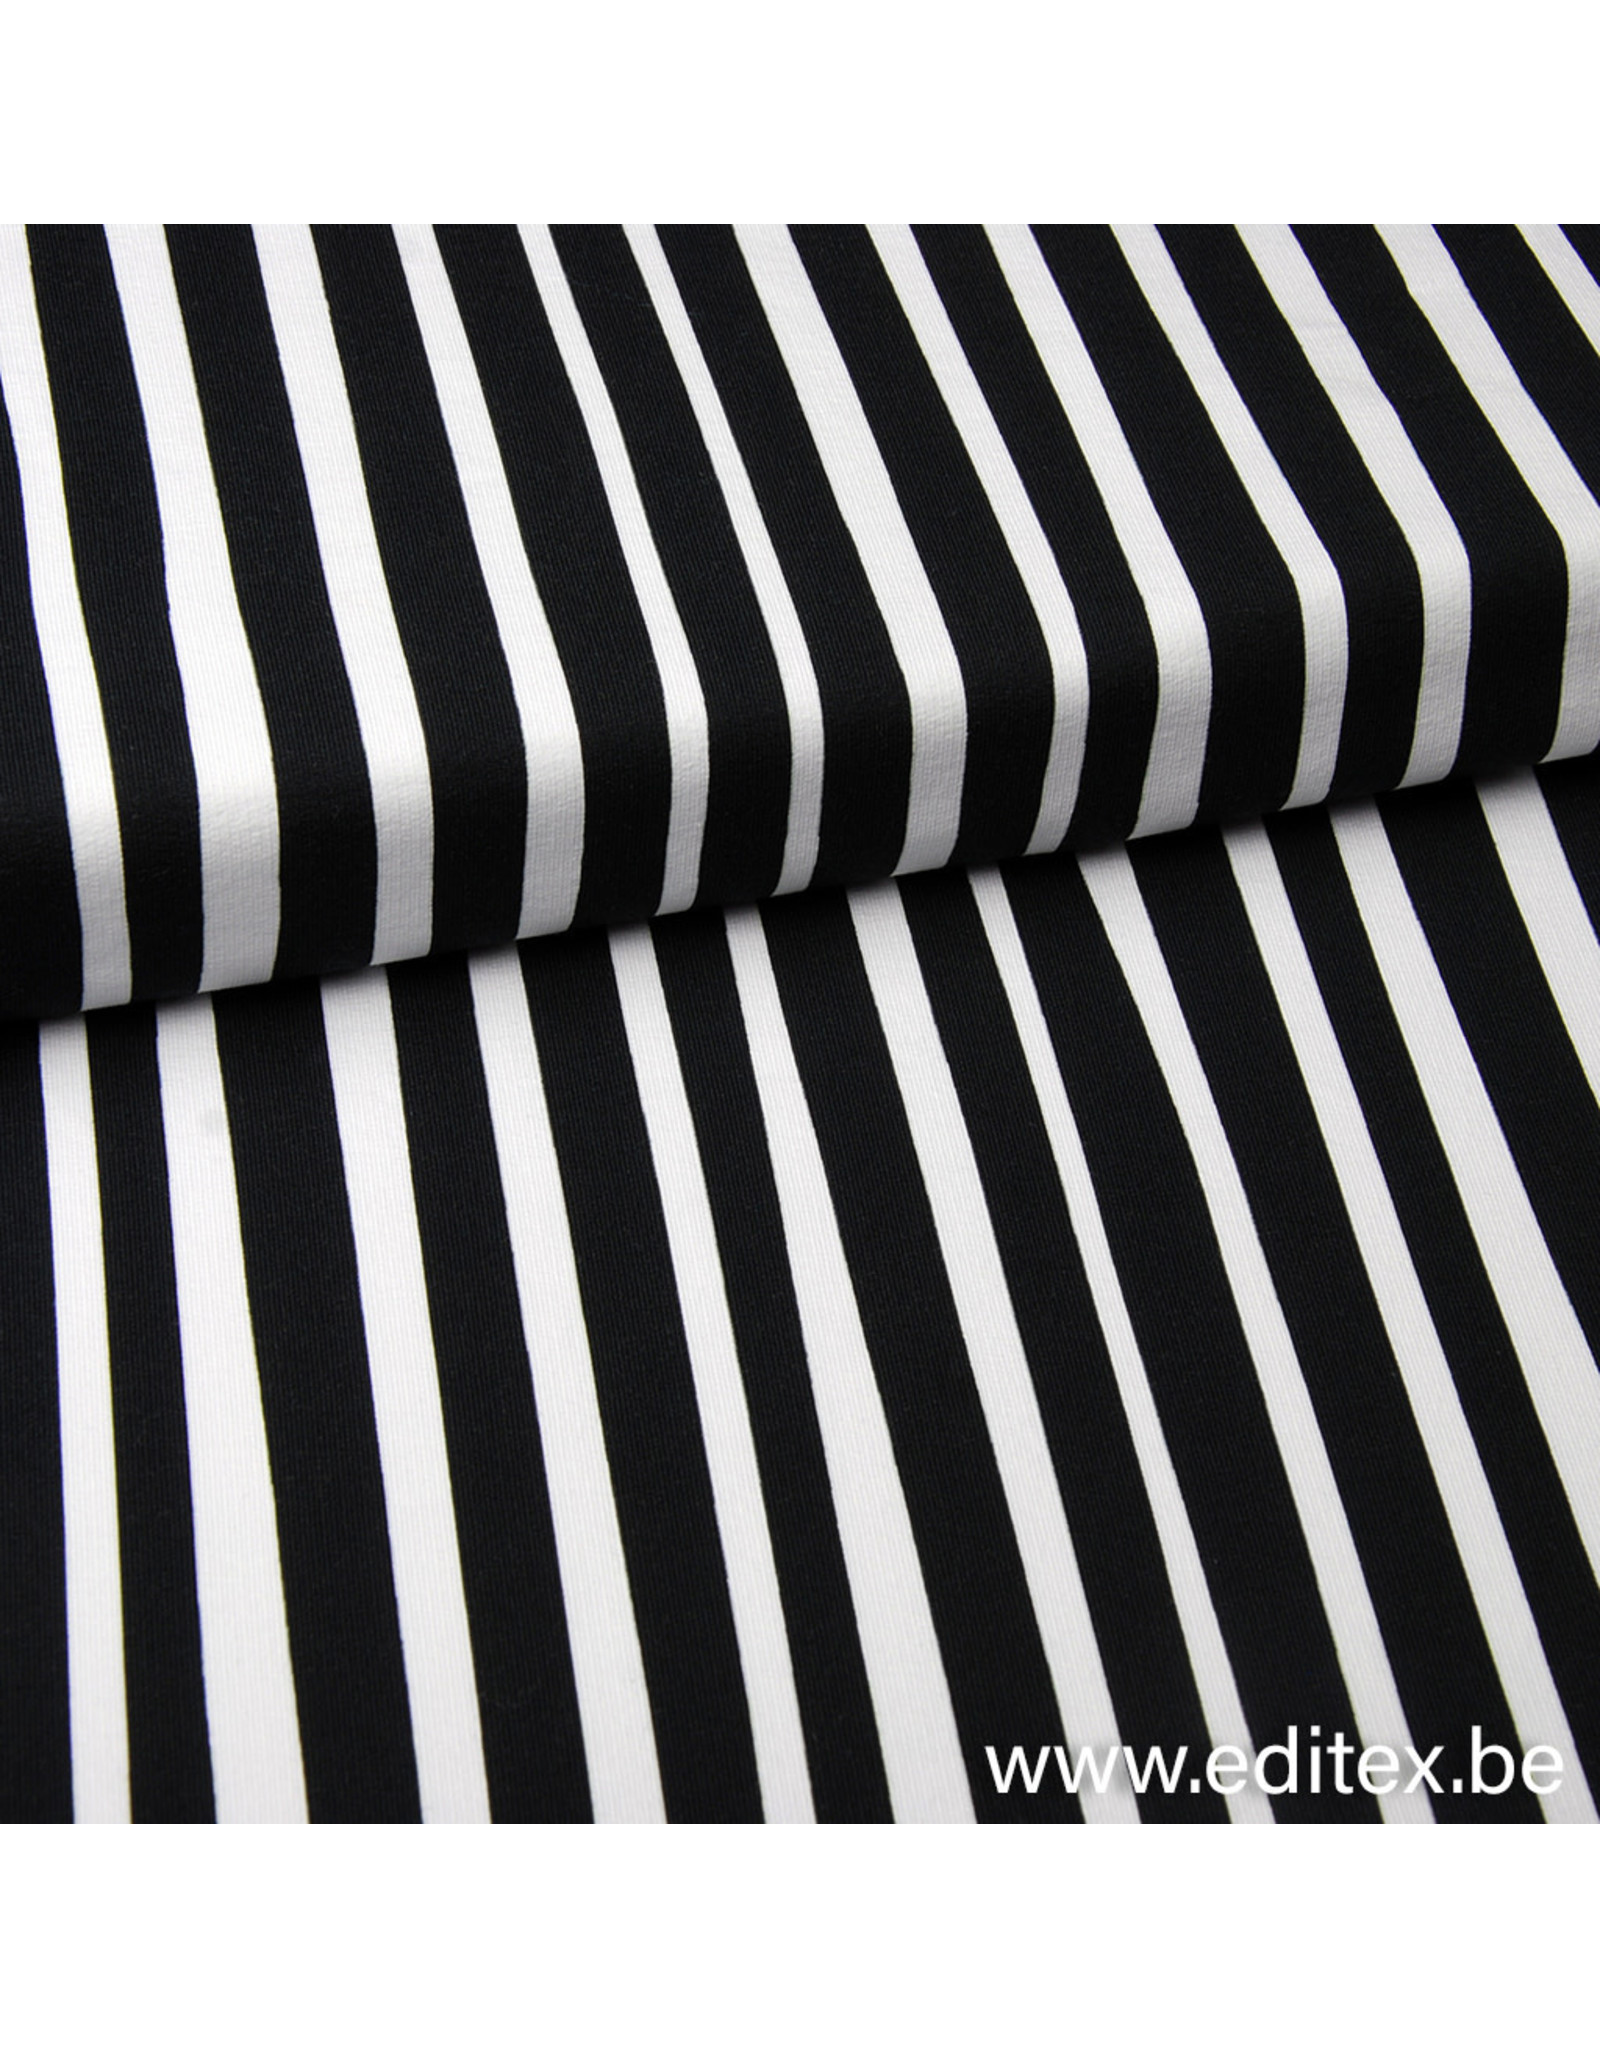 Eva Mouton zebra stripes